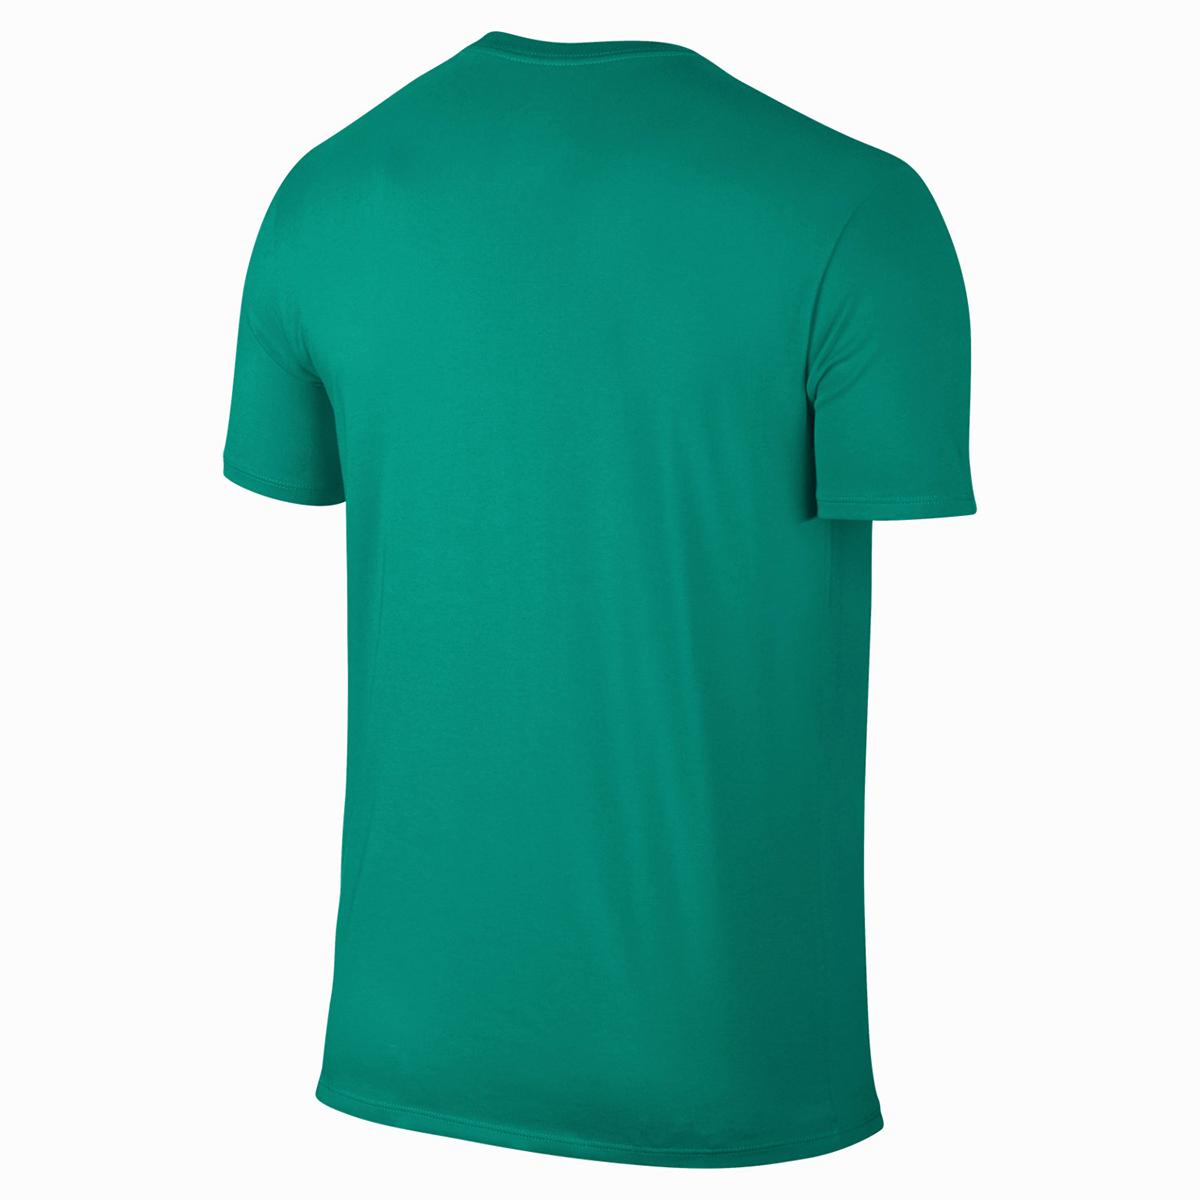 promo code 7bffe f9230 Nike KD Pocket Jersey Tee - SPORTING GOODS Sports Shirts ...